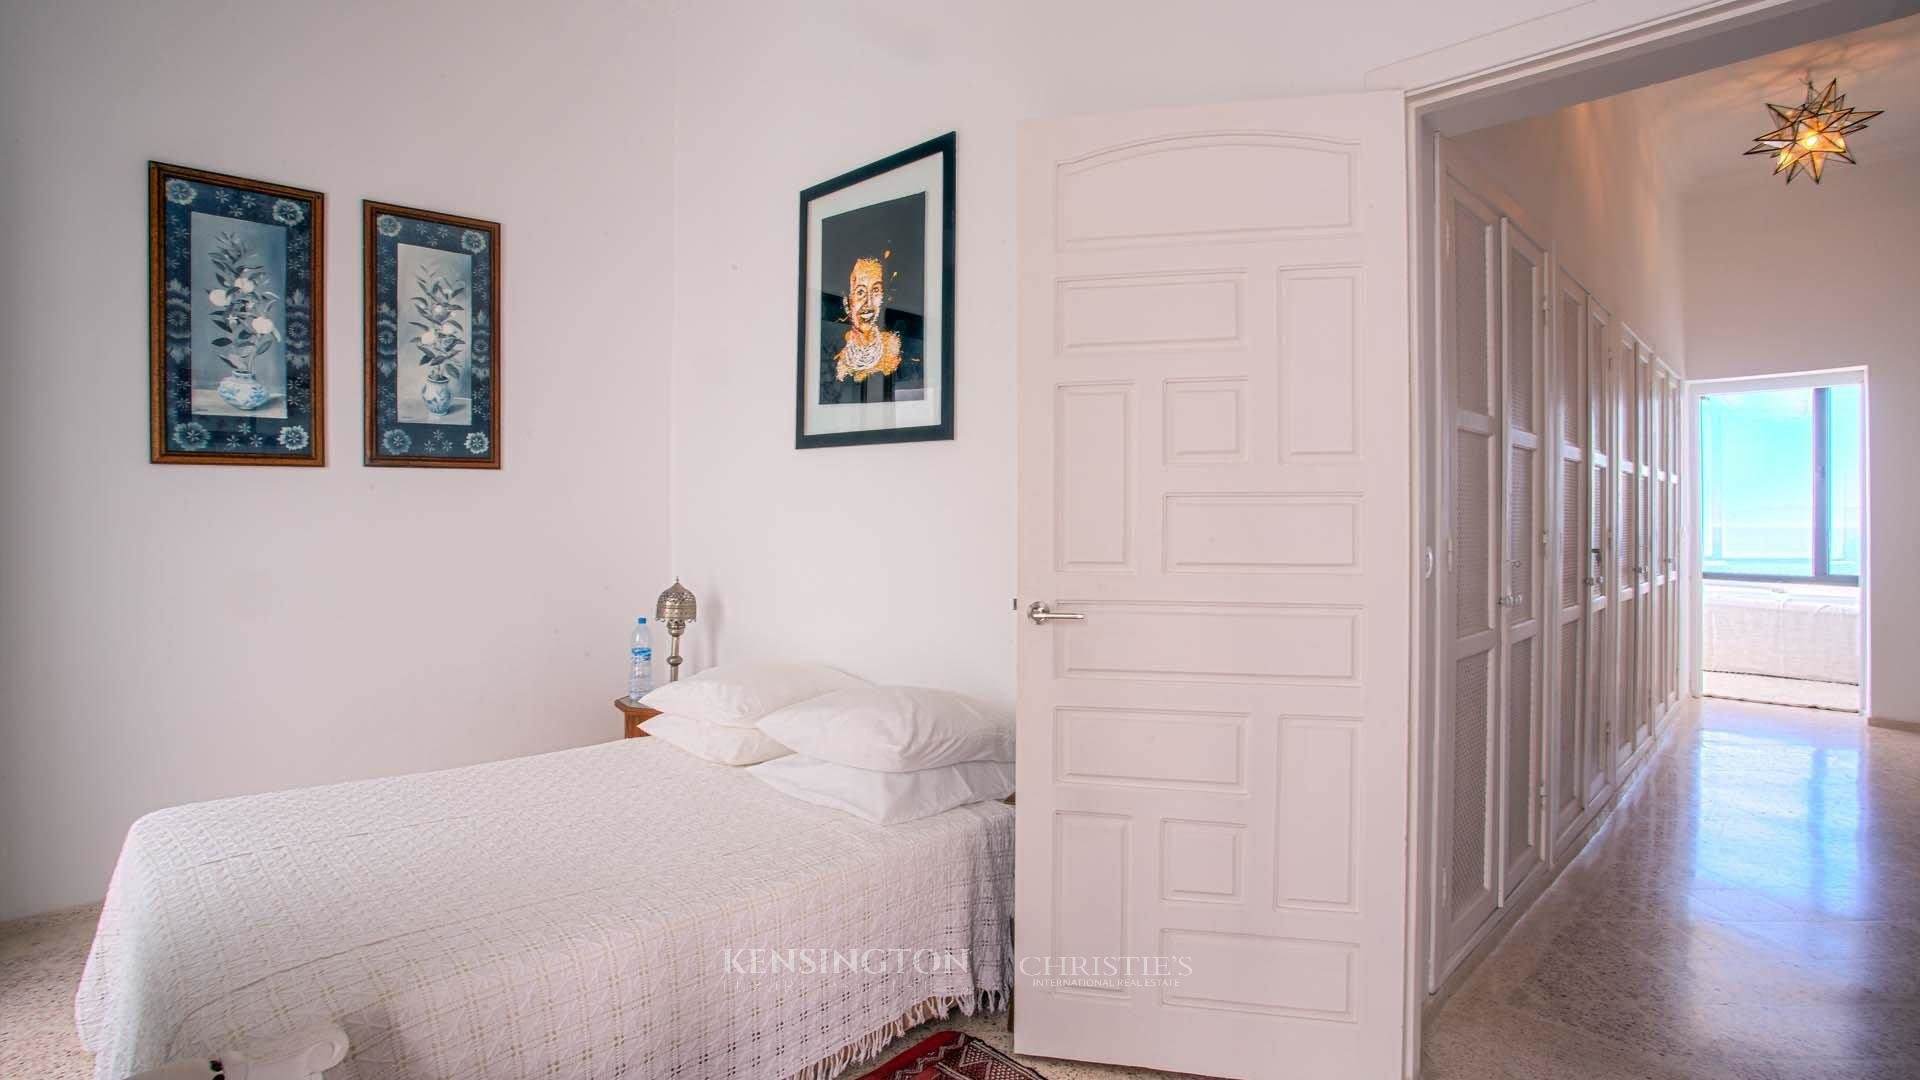 KPPM01242: Villa Fil Luxury Villa Tanger Morocco